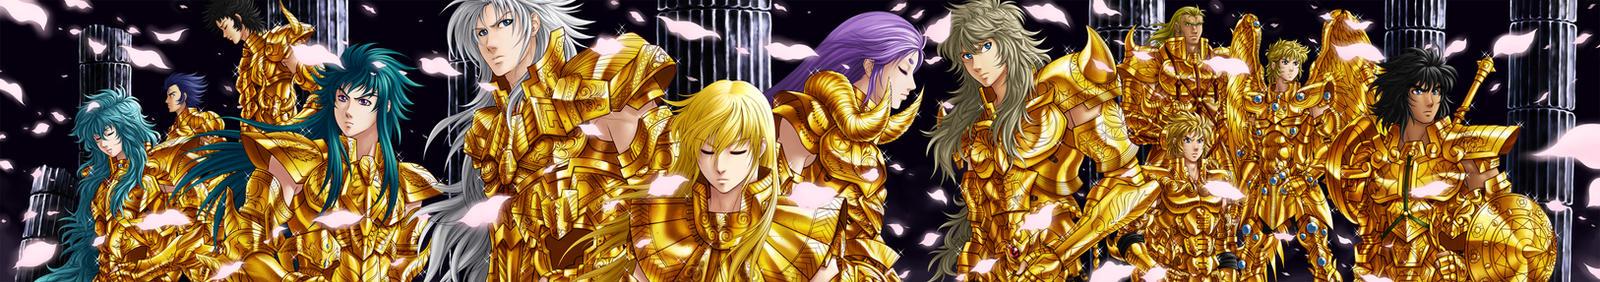 Gold Saints by RXGDO